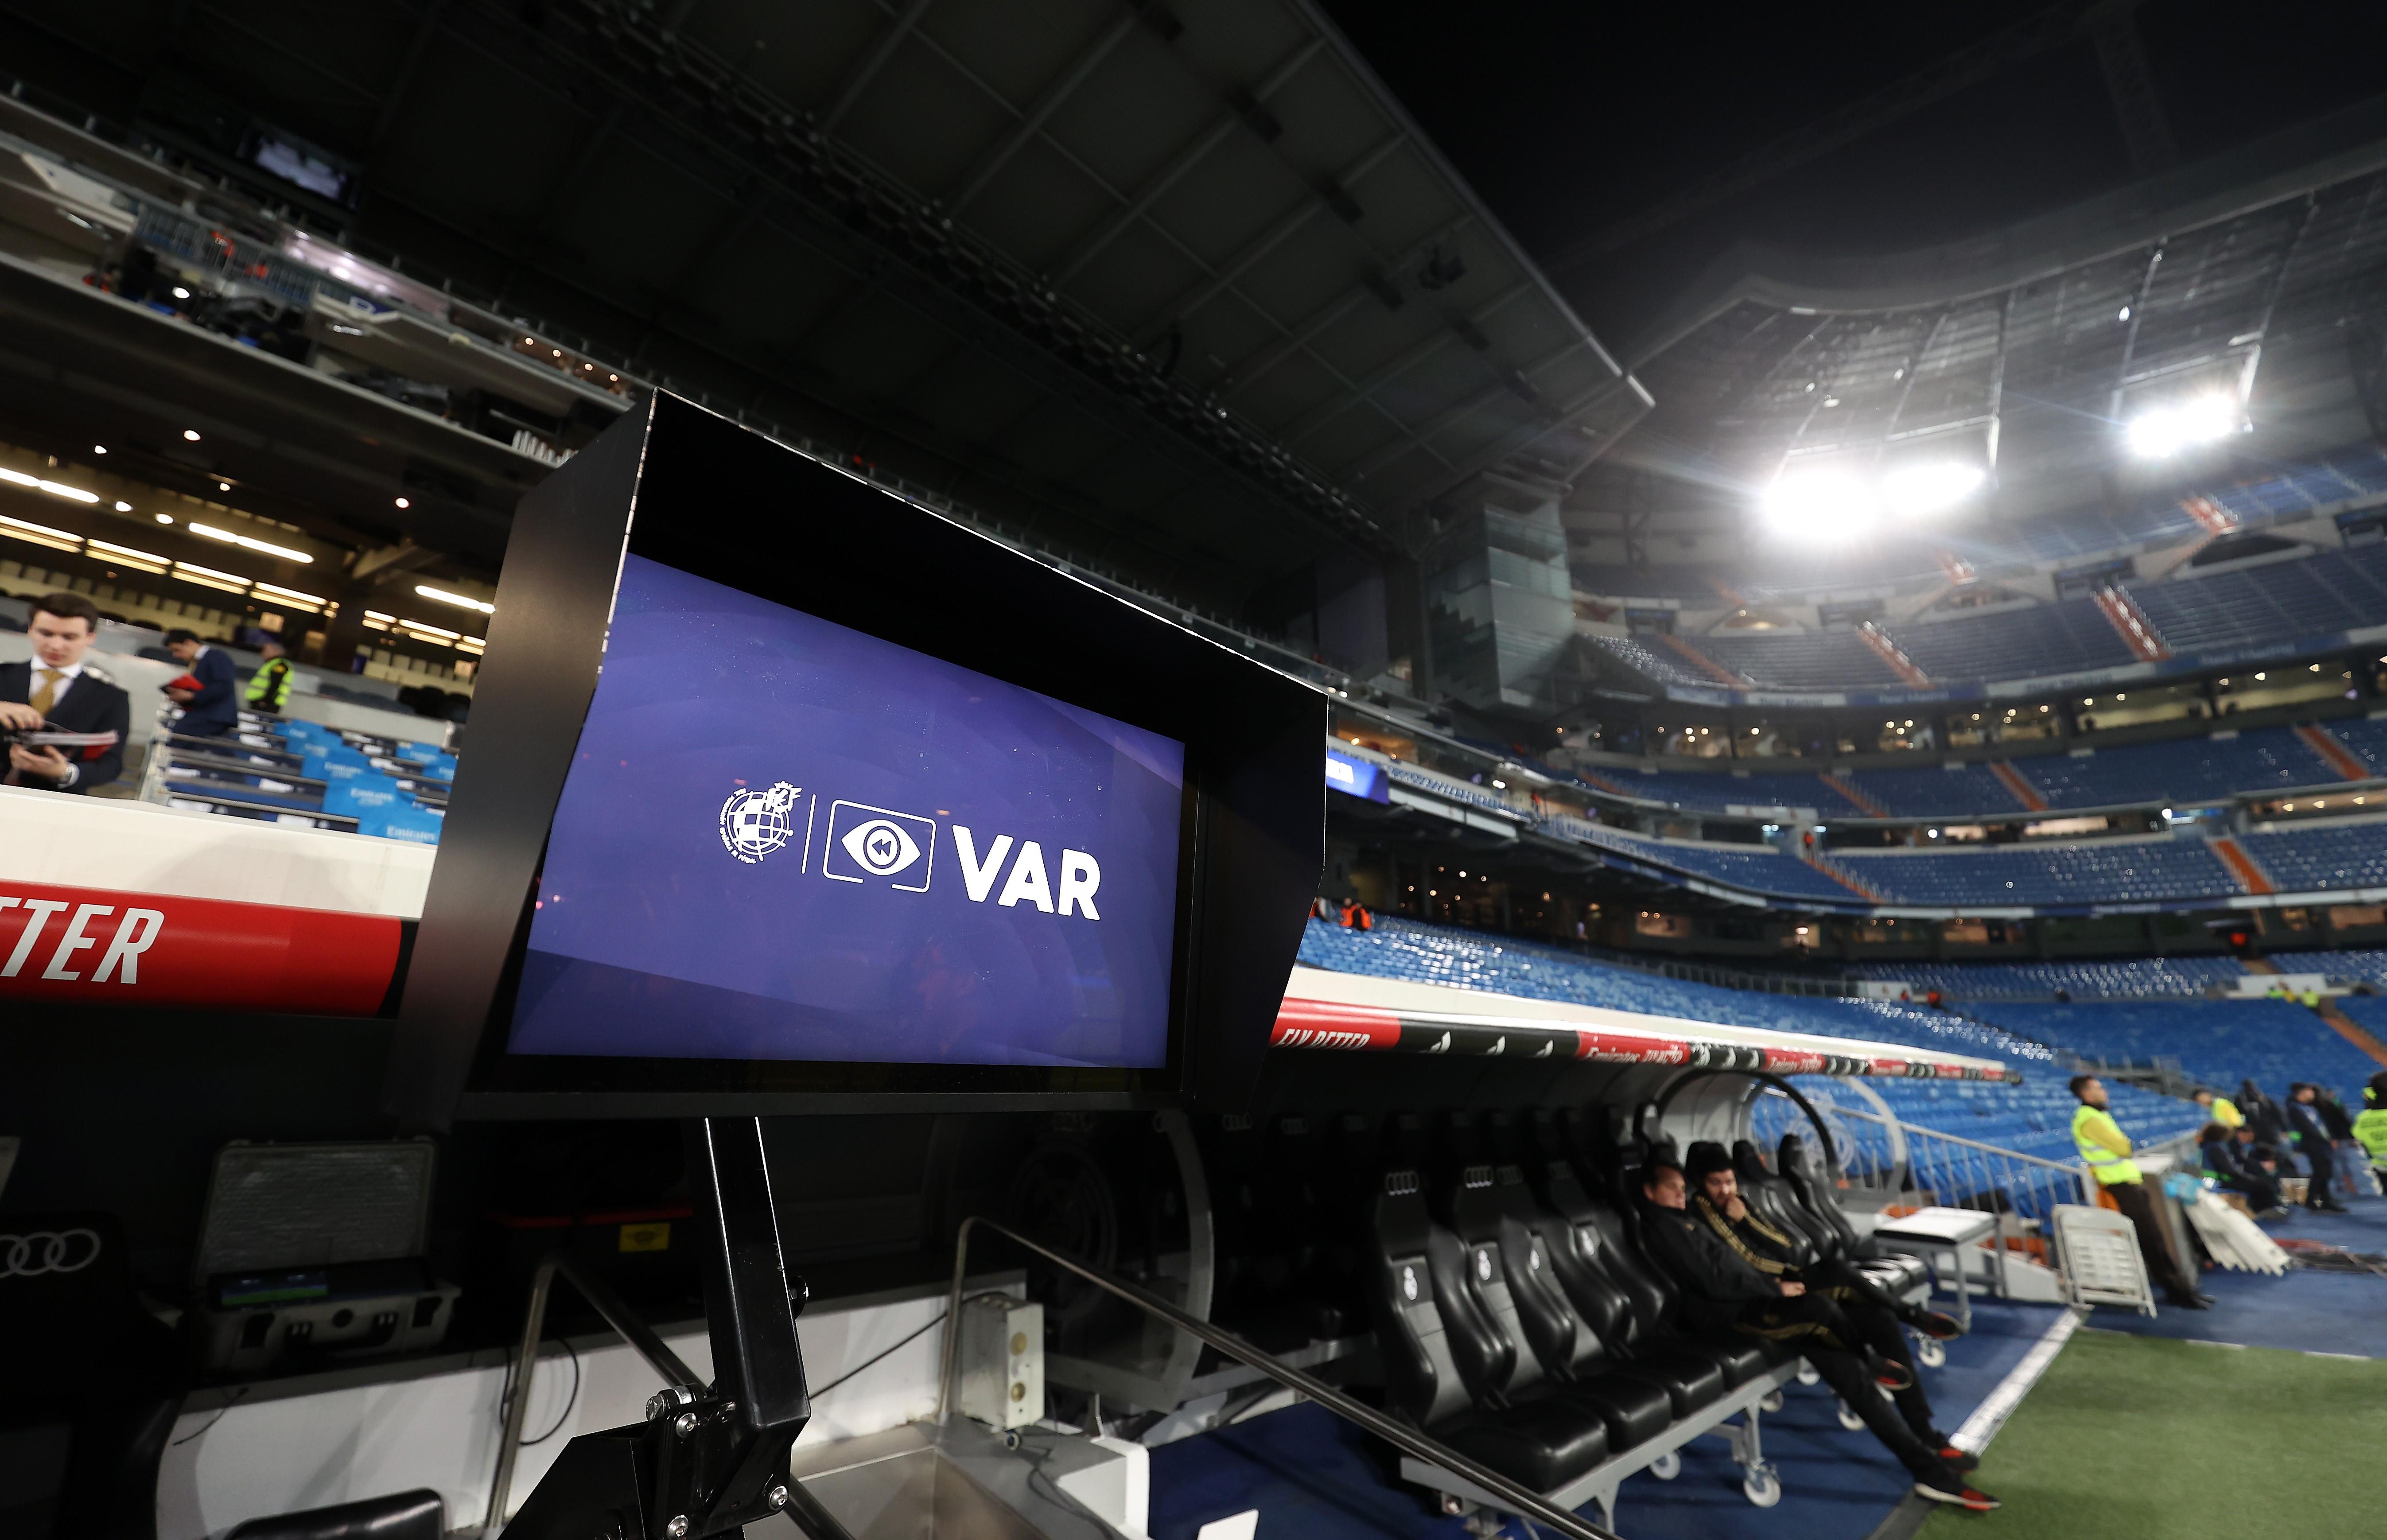 https://i.eurosport.com/2020/07/17/2851354.jpg